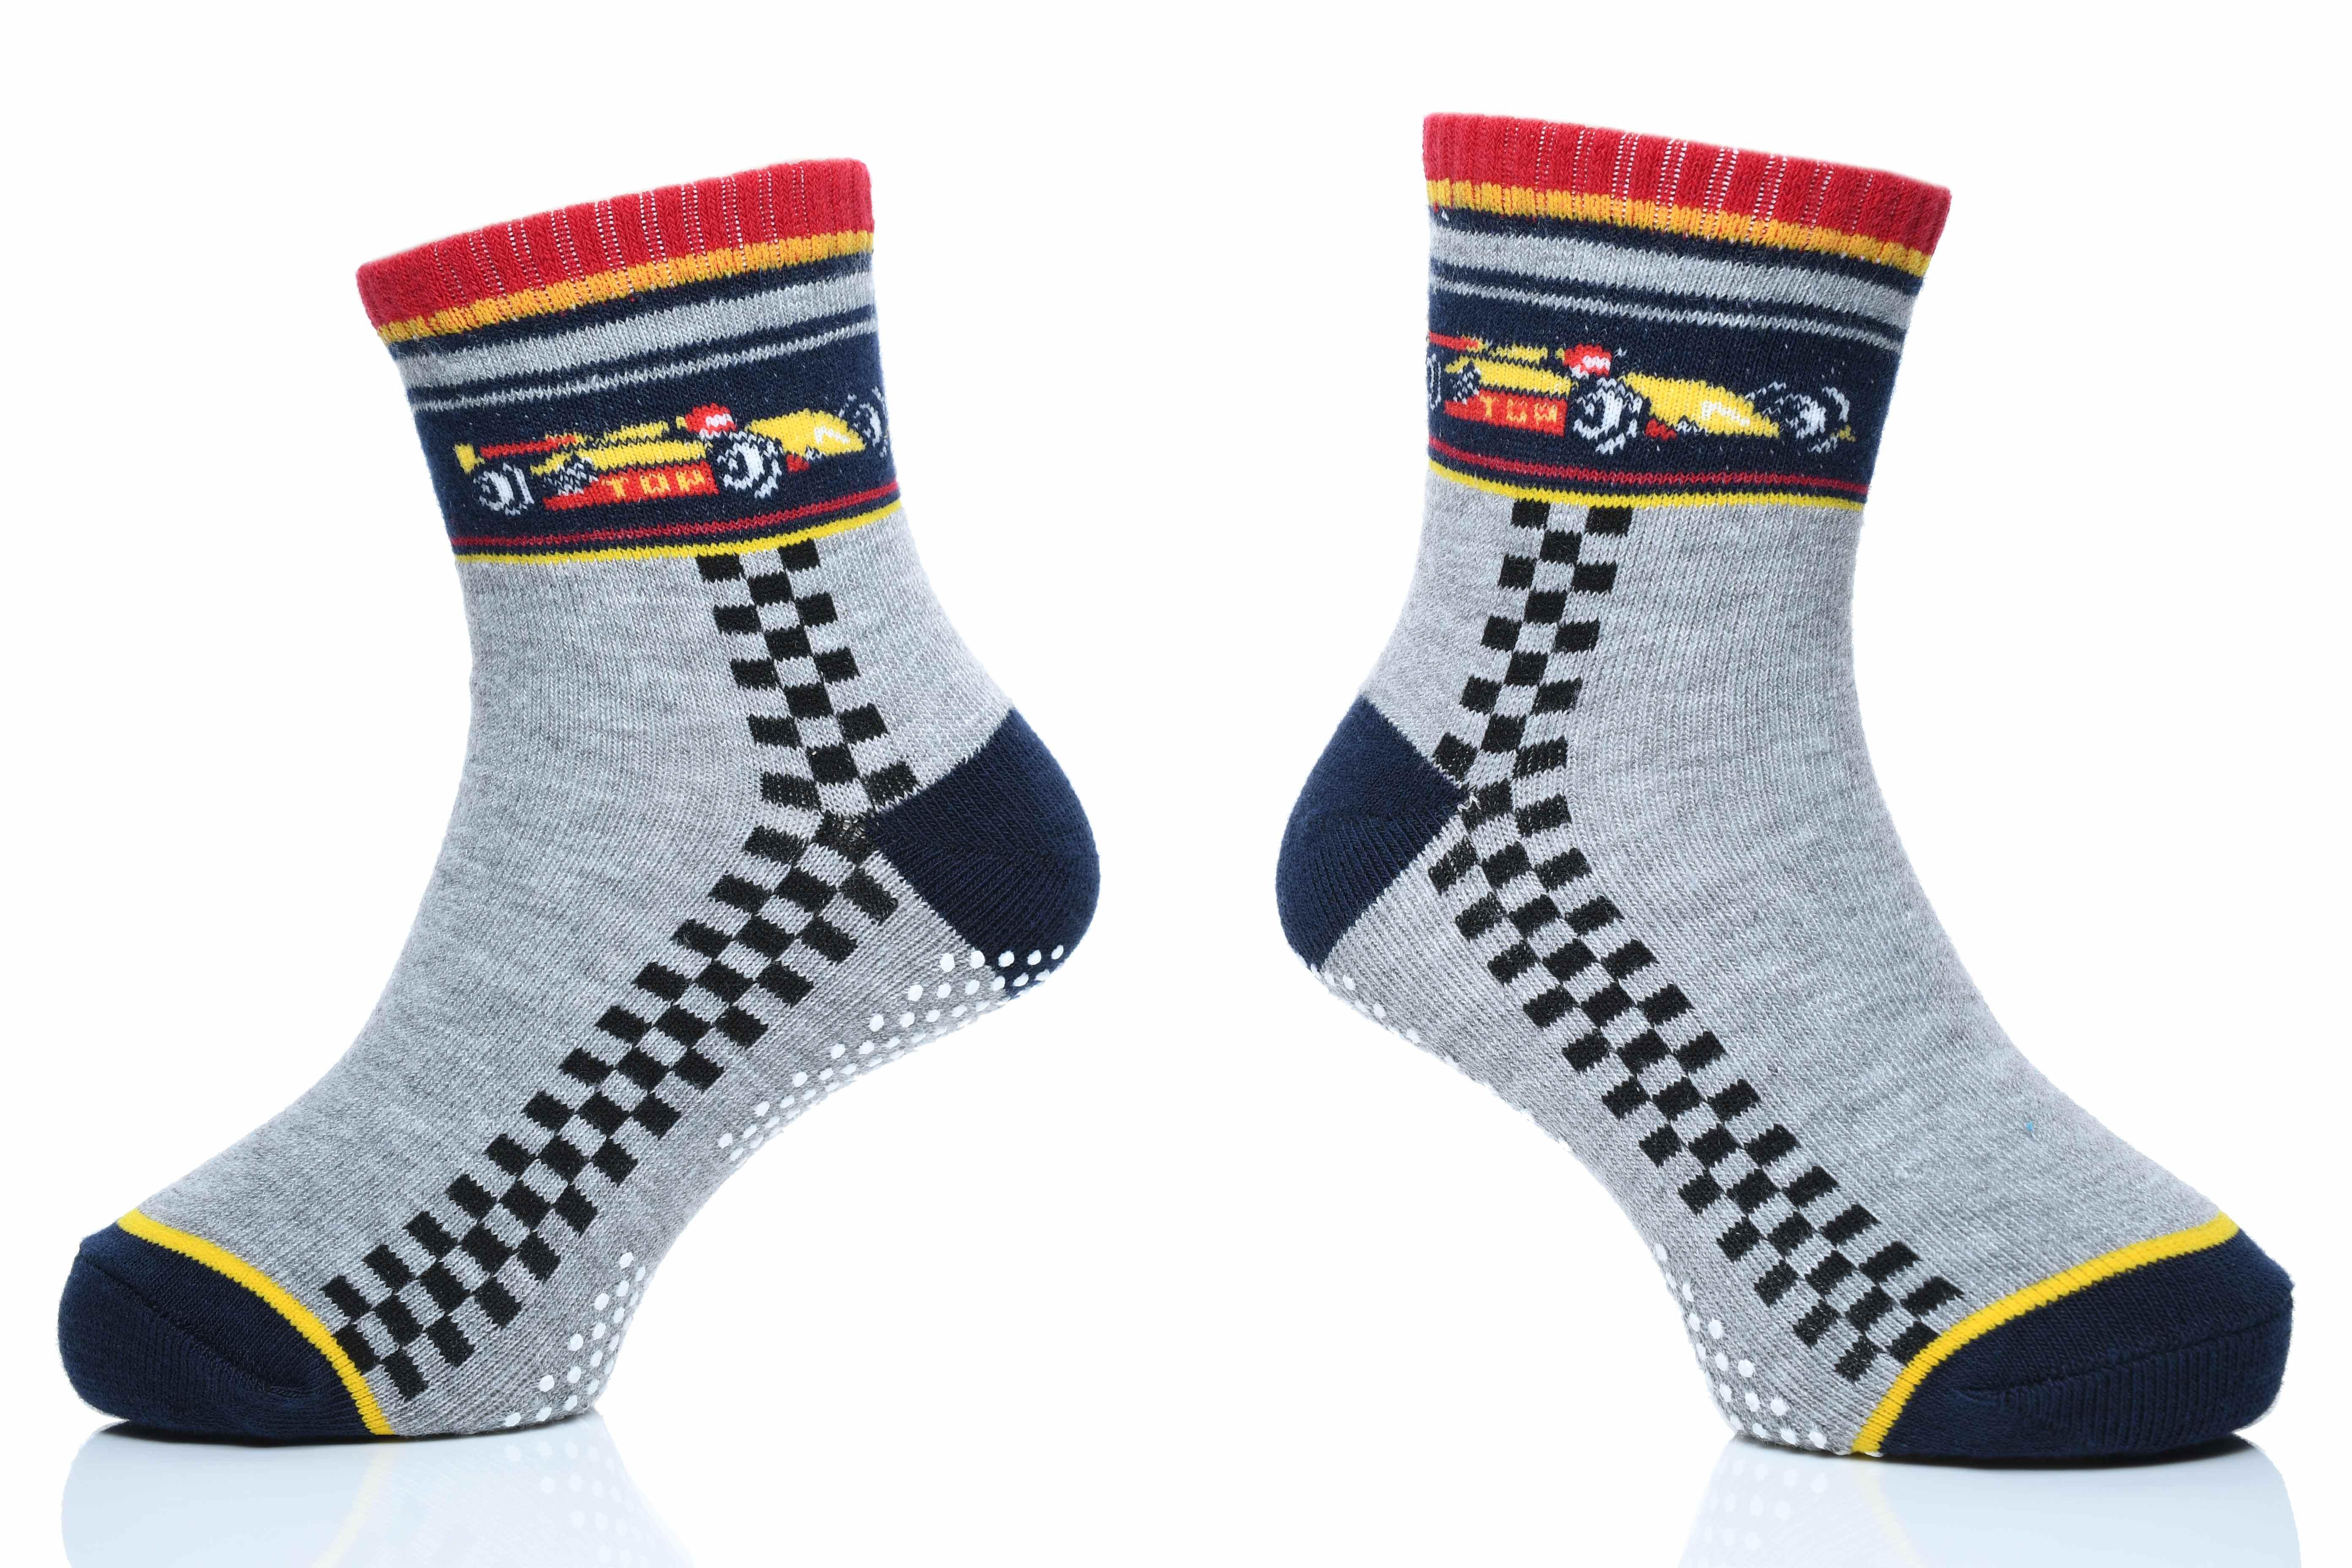 【844】- F1職業賽車手